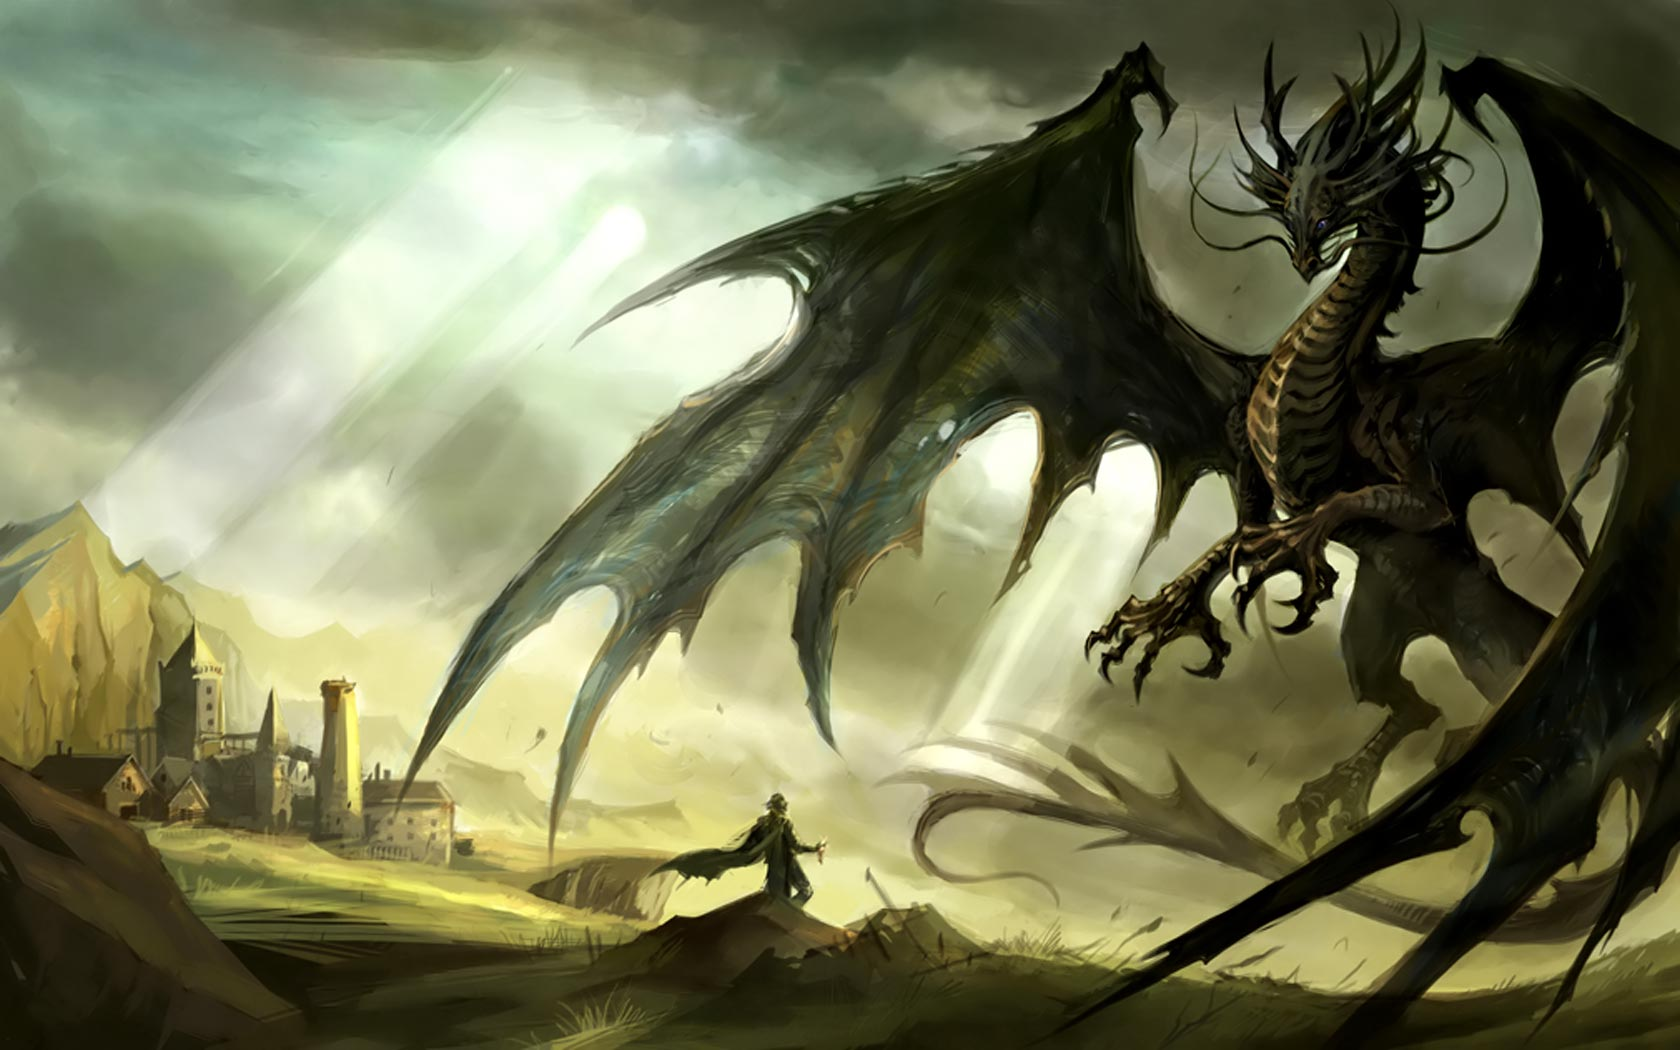 Awesome Dragon Backgrounds - WallpaperSafari